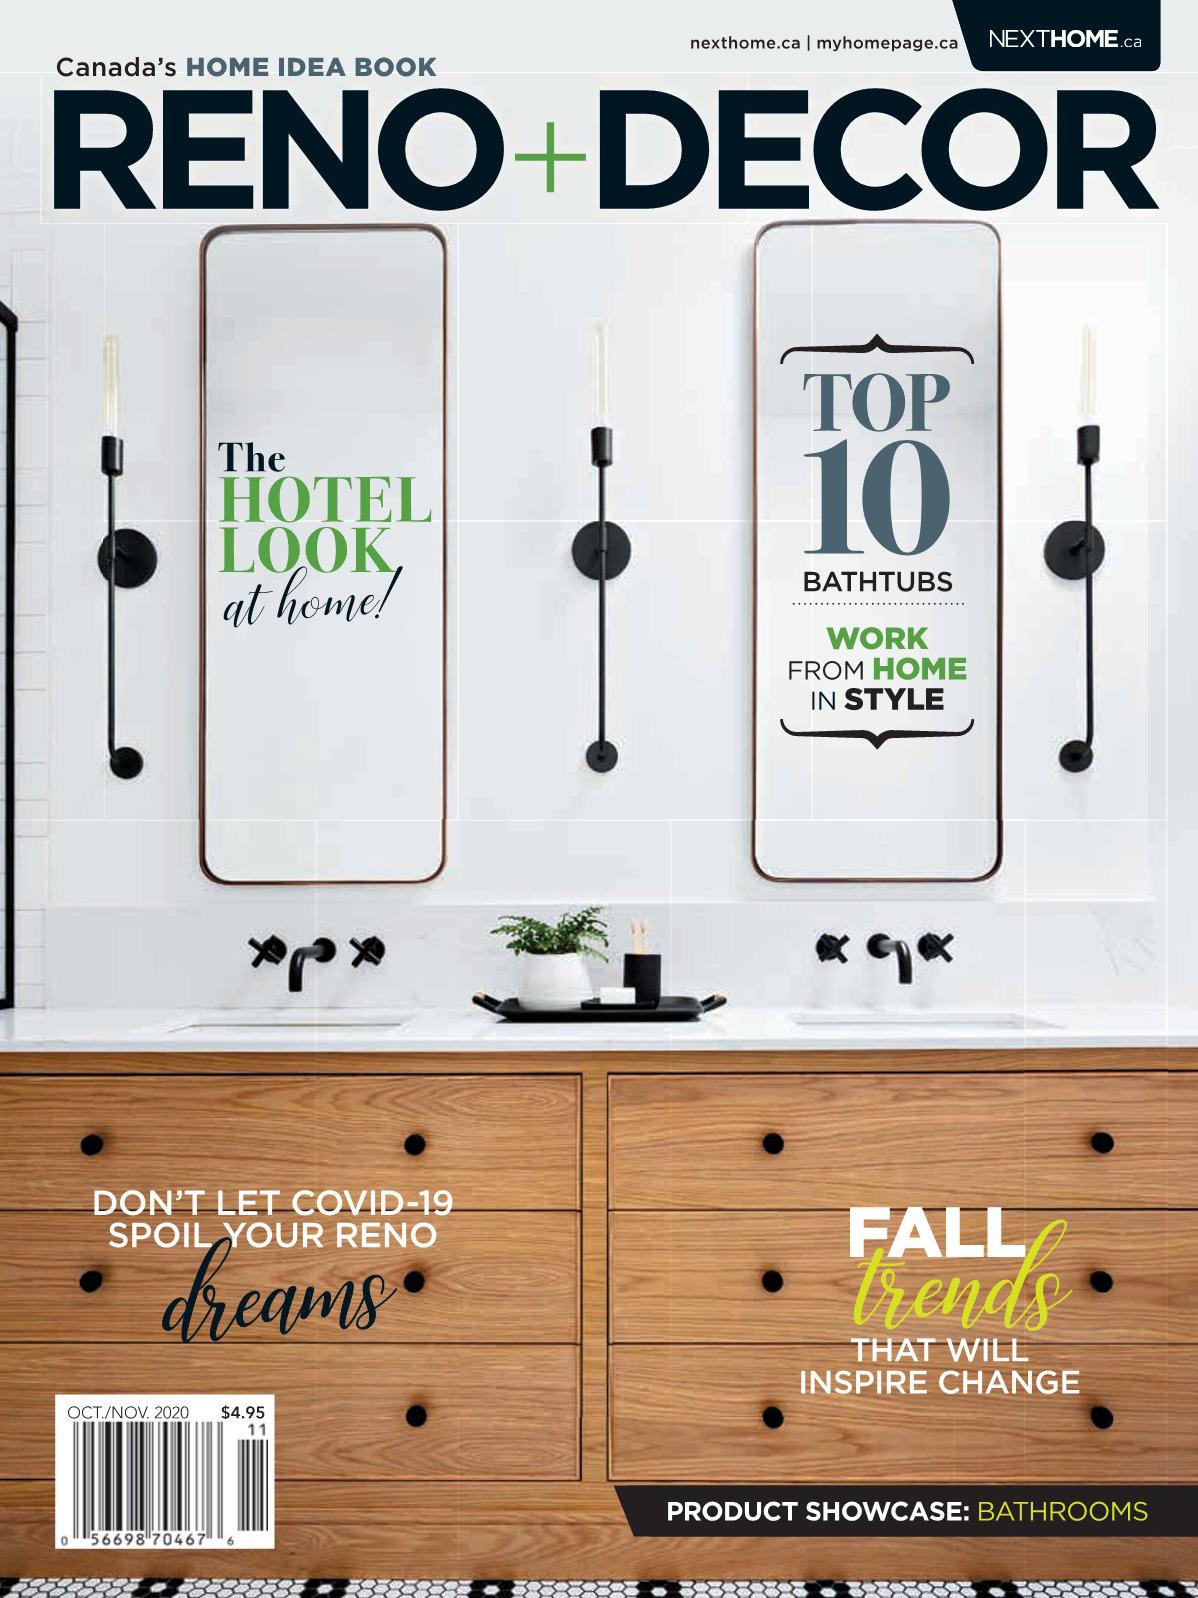 《Reno & Decor》加拿大版室内装饰设计杂志2020年10月-11月号